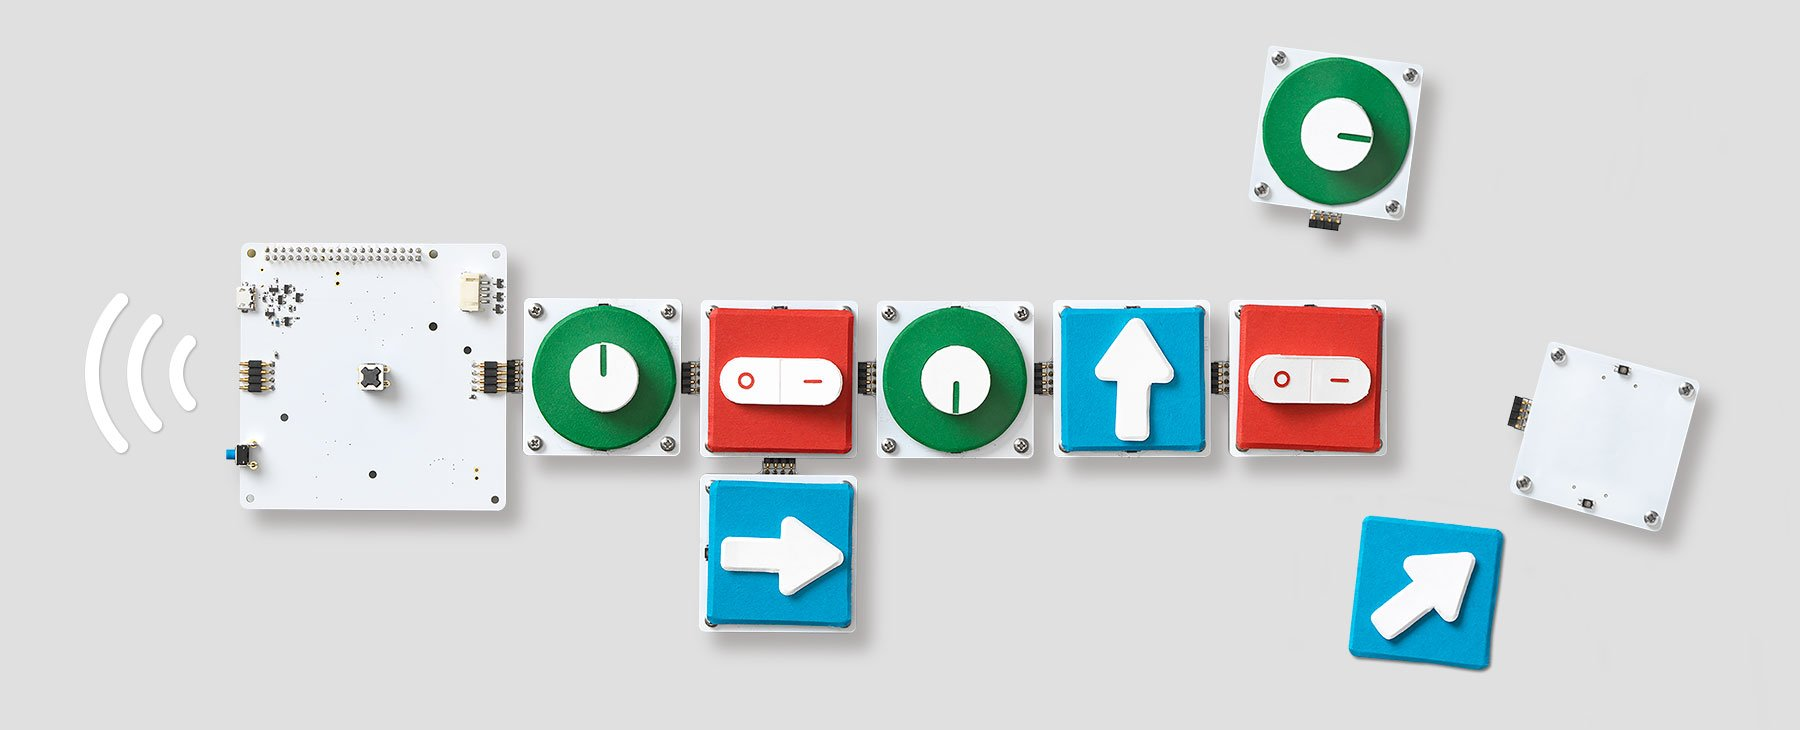 Google Project Bloks